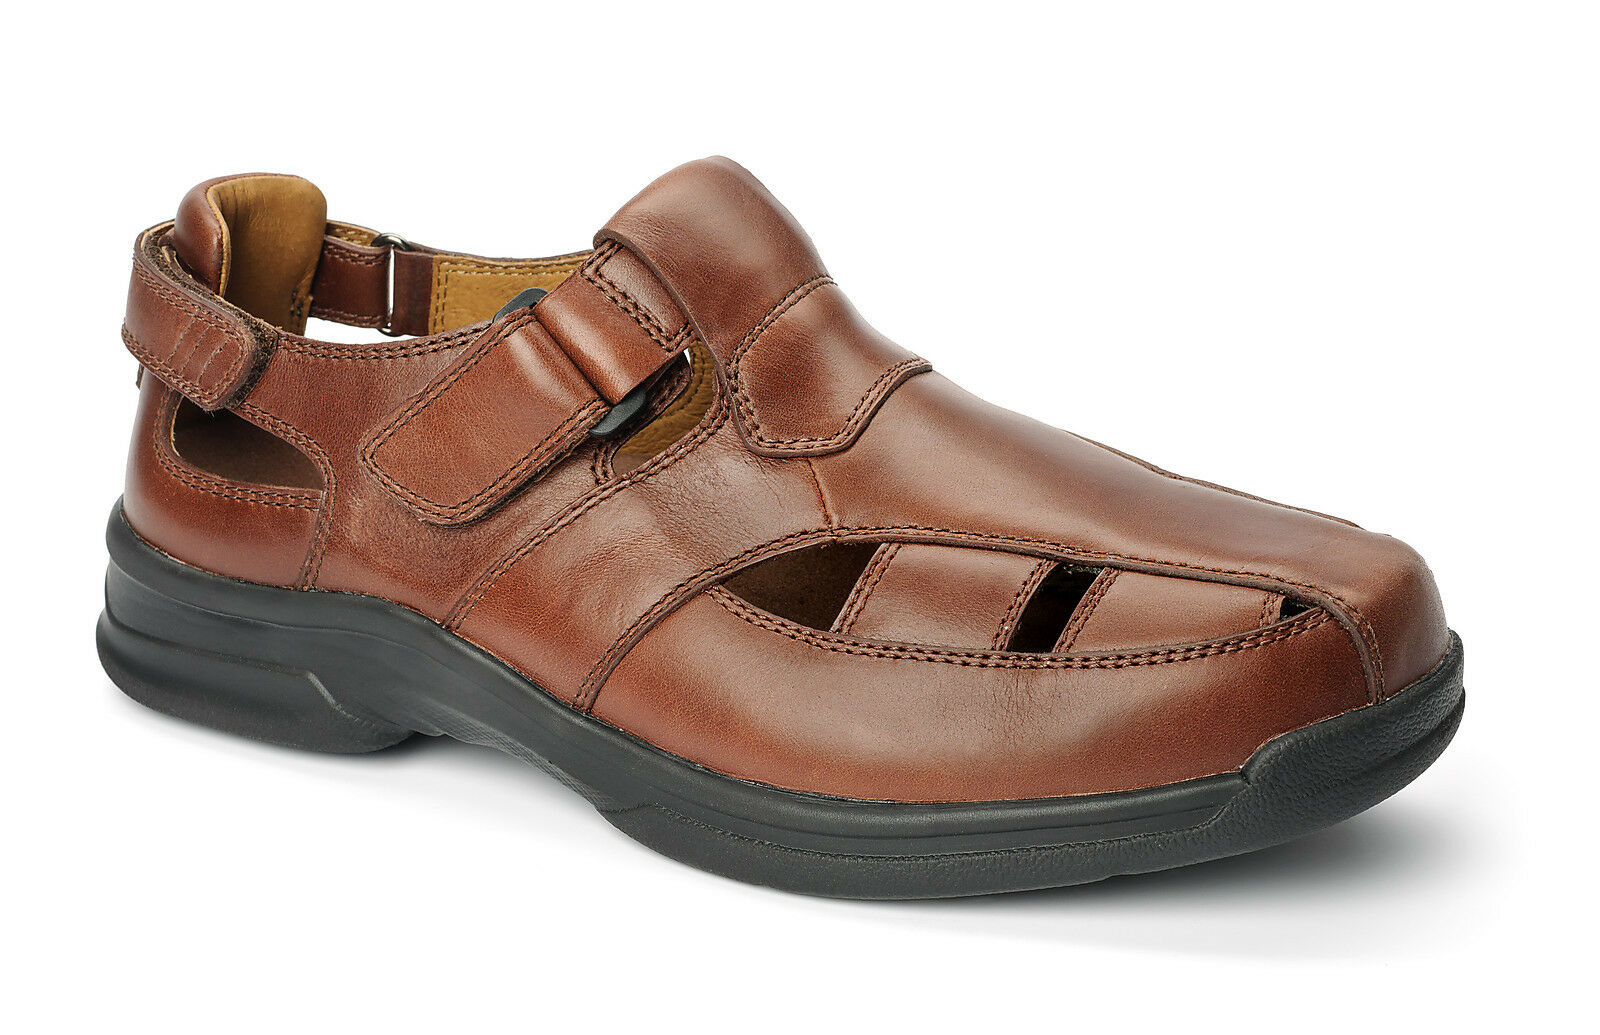 Oasis Roland Uomo Leather Fisherman Sandal - - - New in Box 133edc